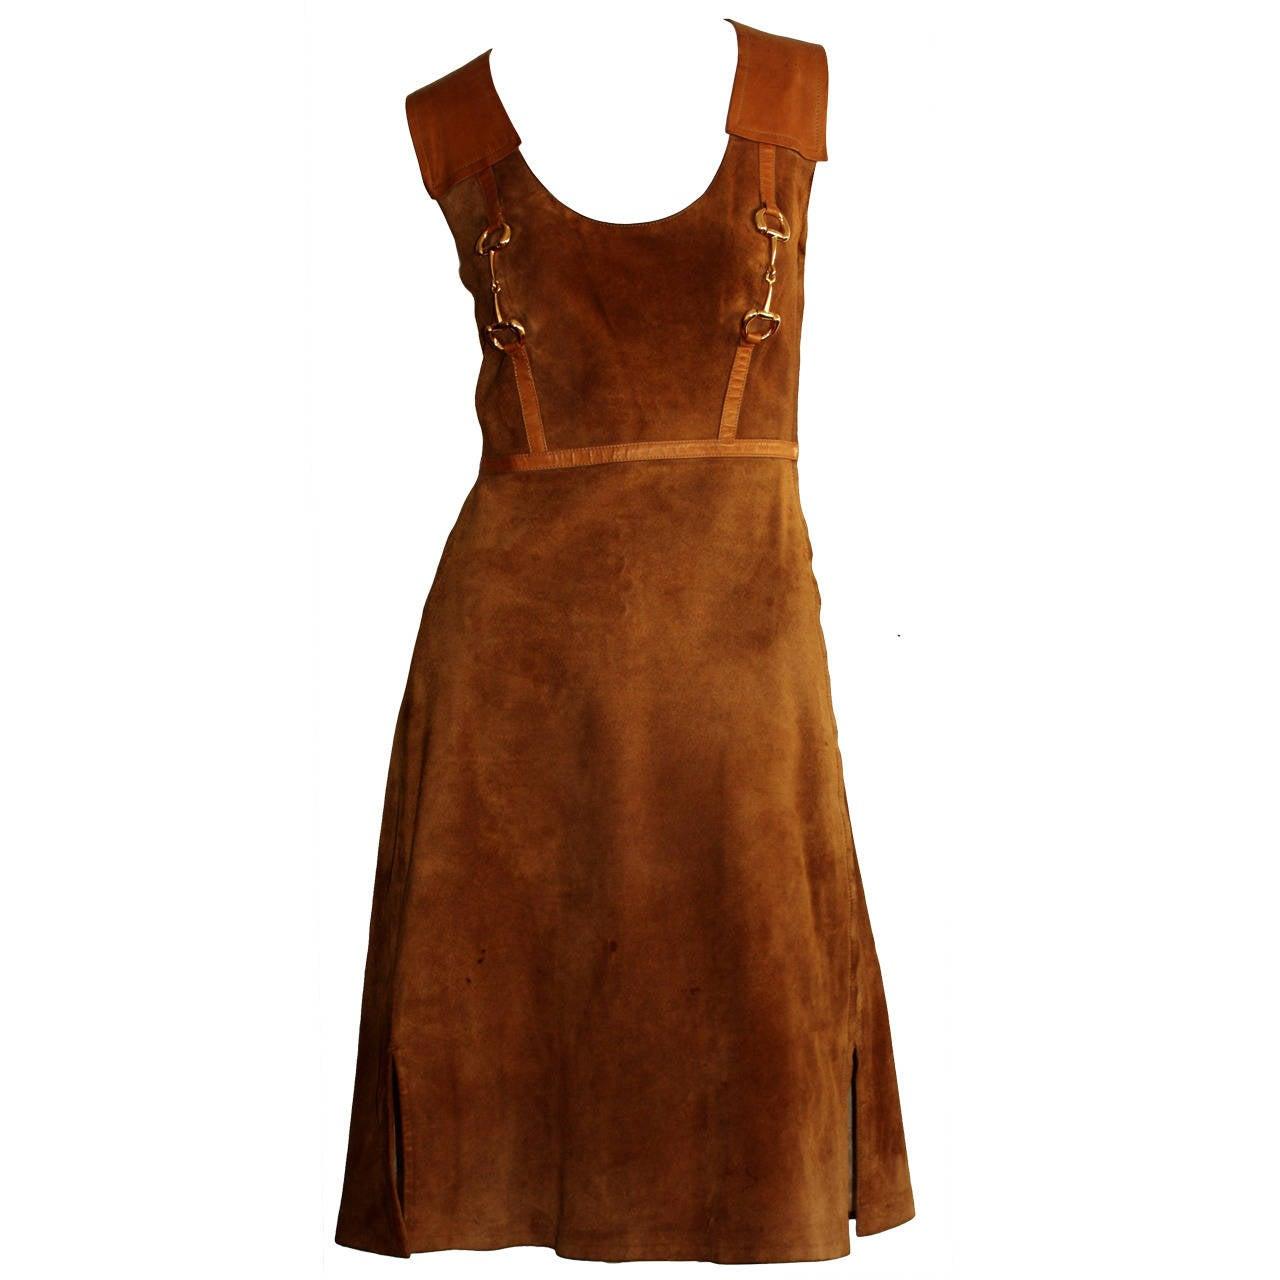 Rare Vintage 1960s Gucci Tan Leather Horsebit A - Line Space Age Dress 1